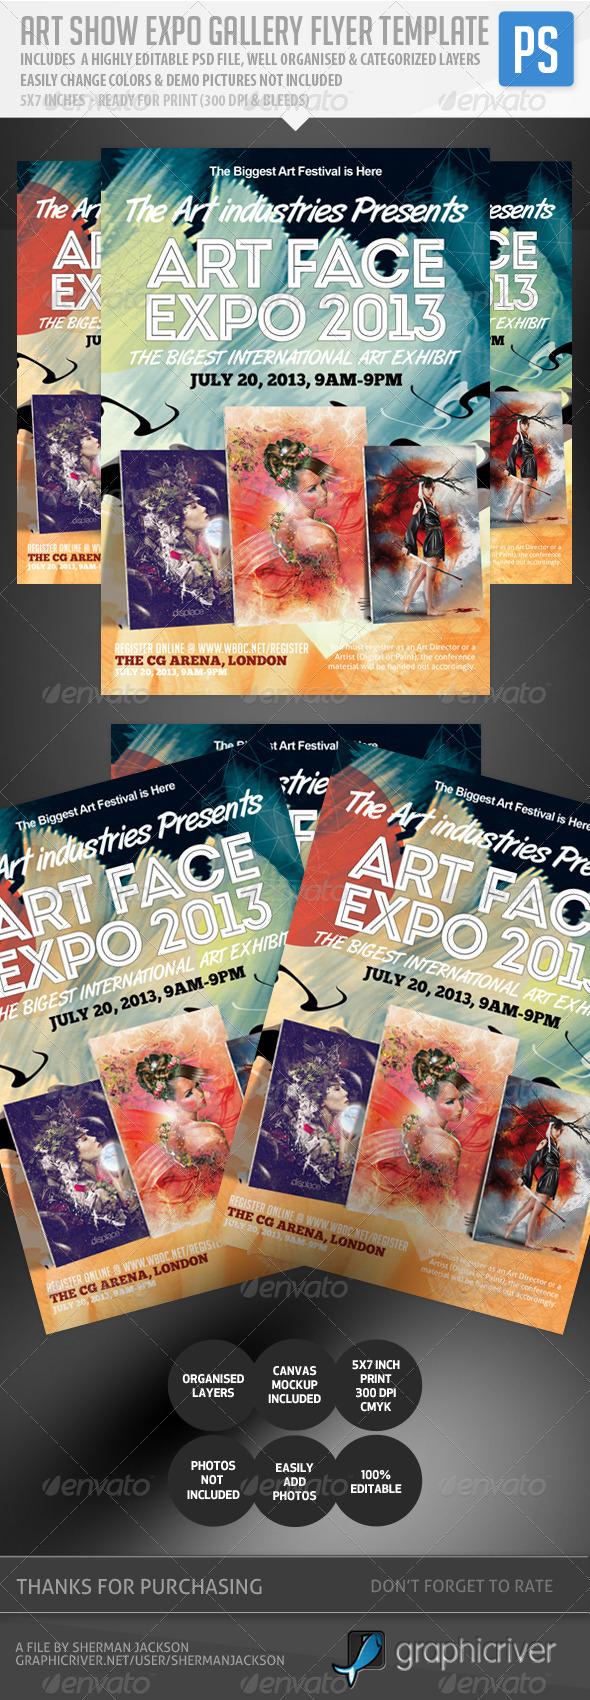 GraphicRiver Art Show Expo Flyer Template V.2 5098929